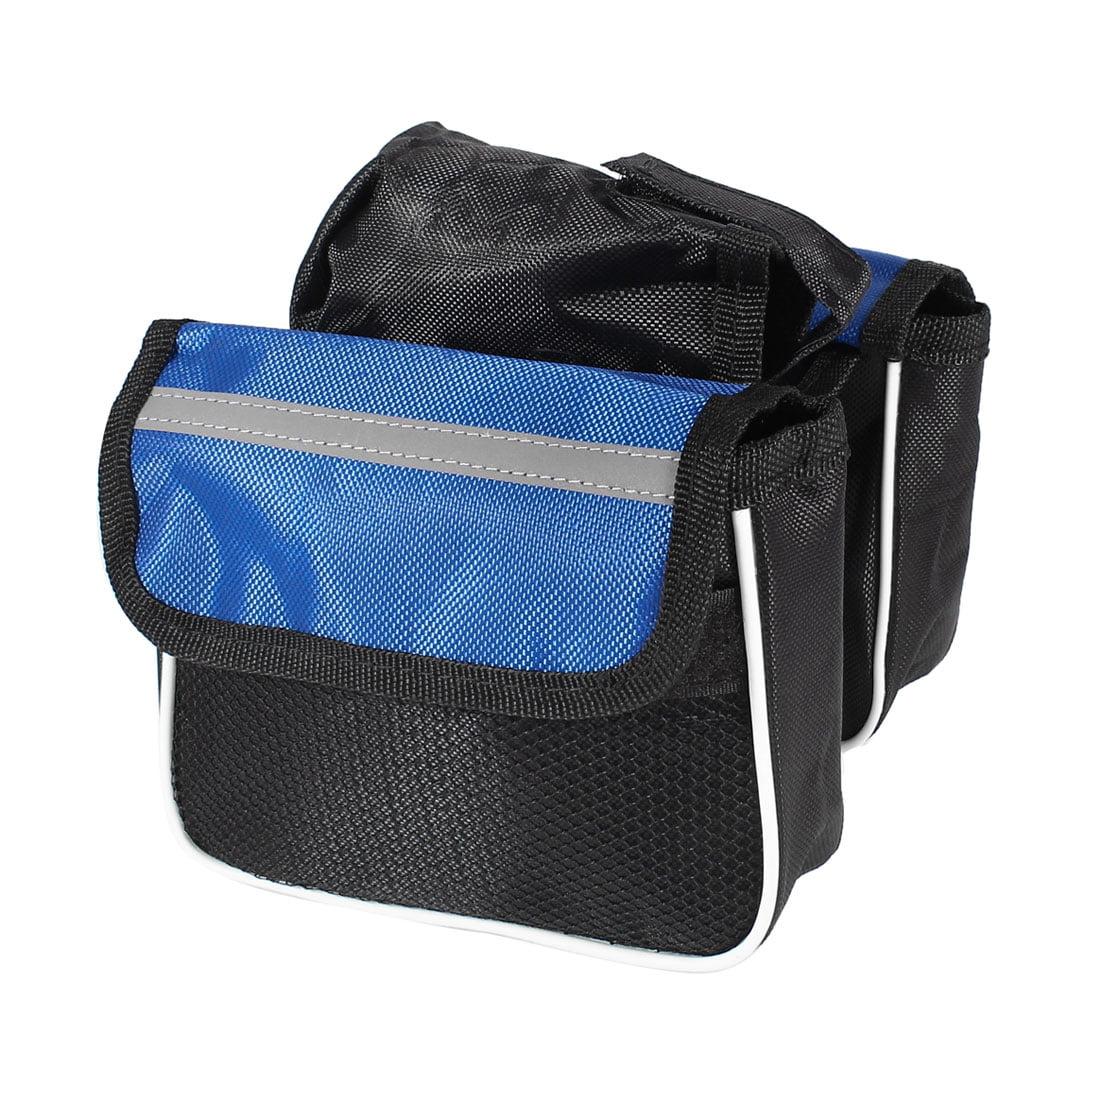 Black Blue Nylon Mesh Cycling Front Bicycle Bike Saddle Reflective Bag Pouch